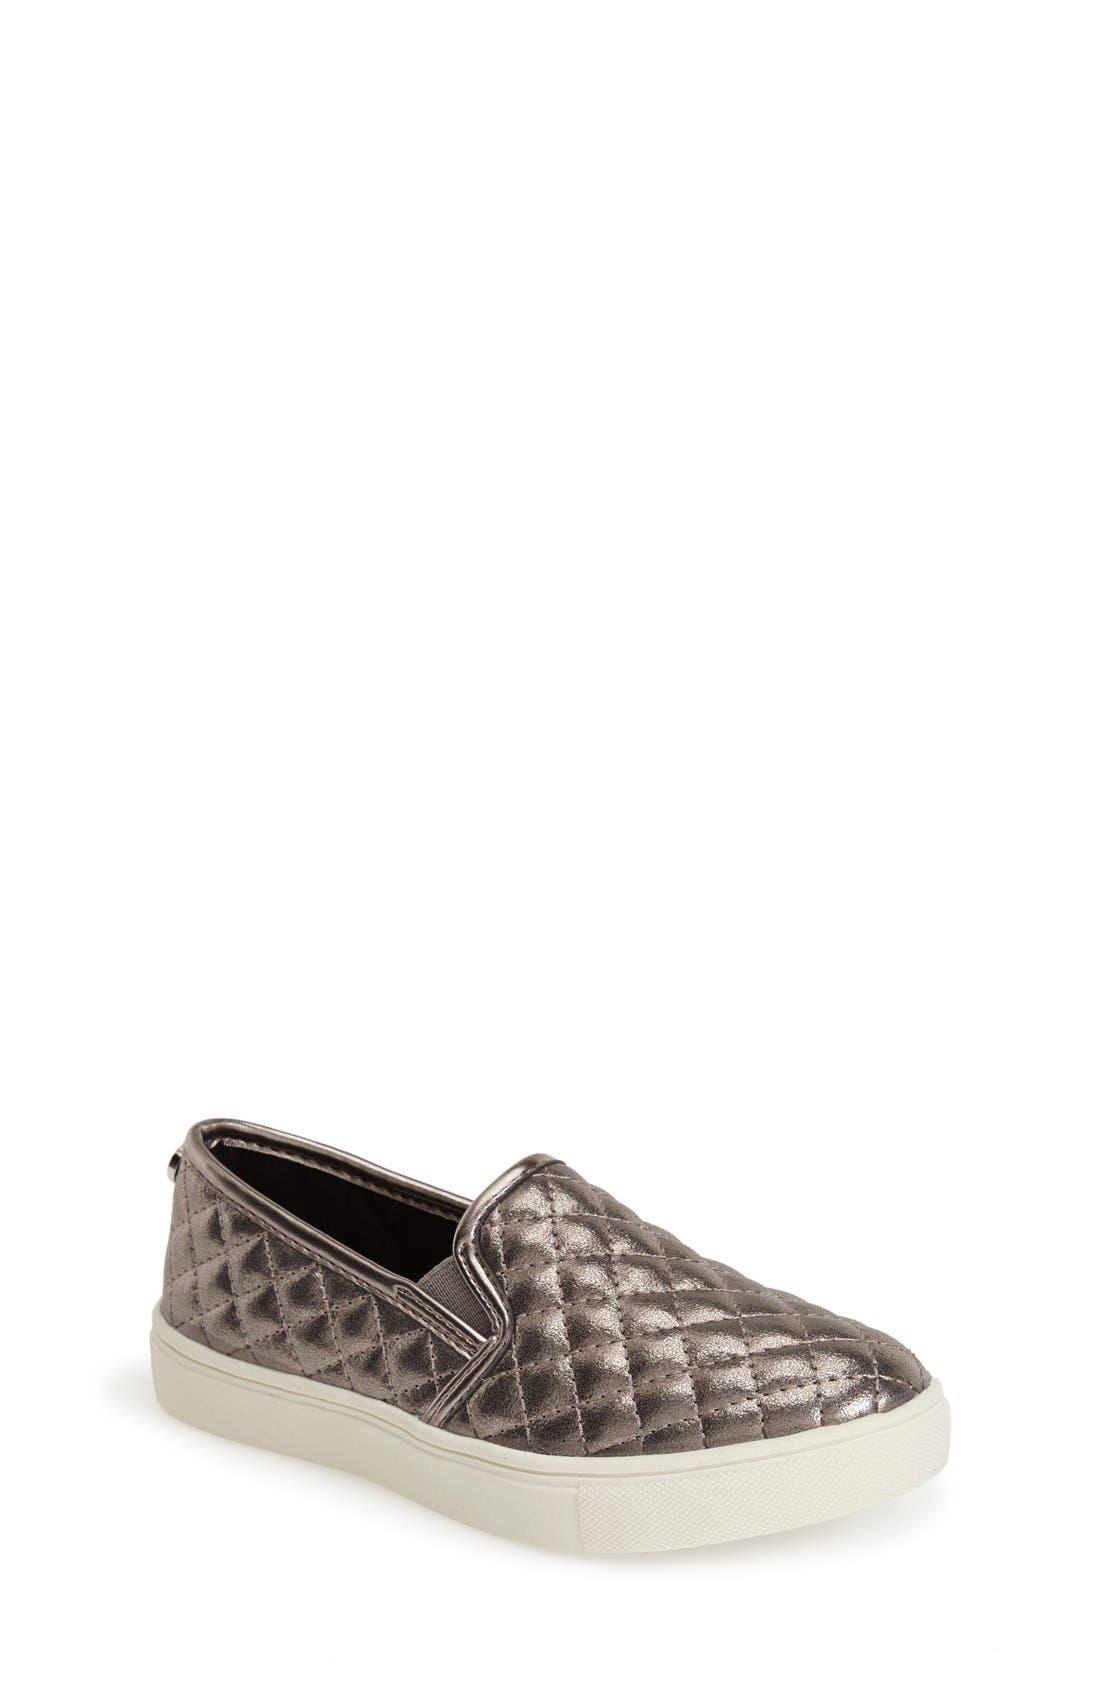 STEVE MADDEN Ecentrcq Sneaker, Main, color, SILVER